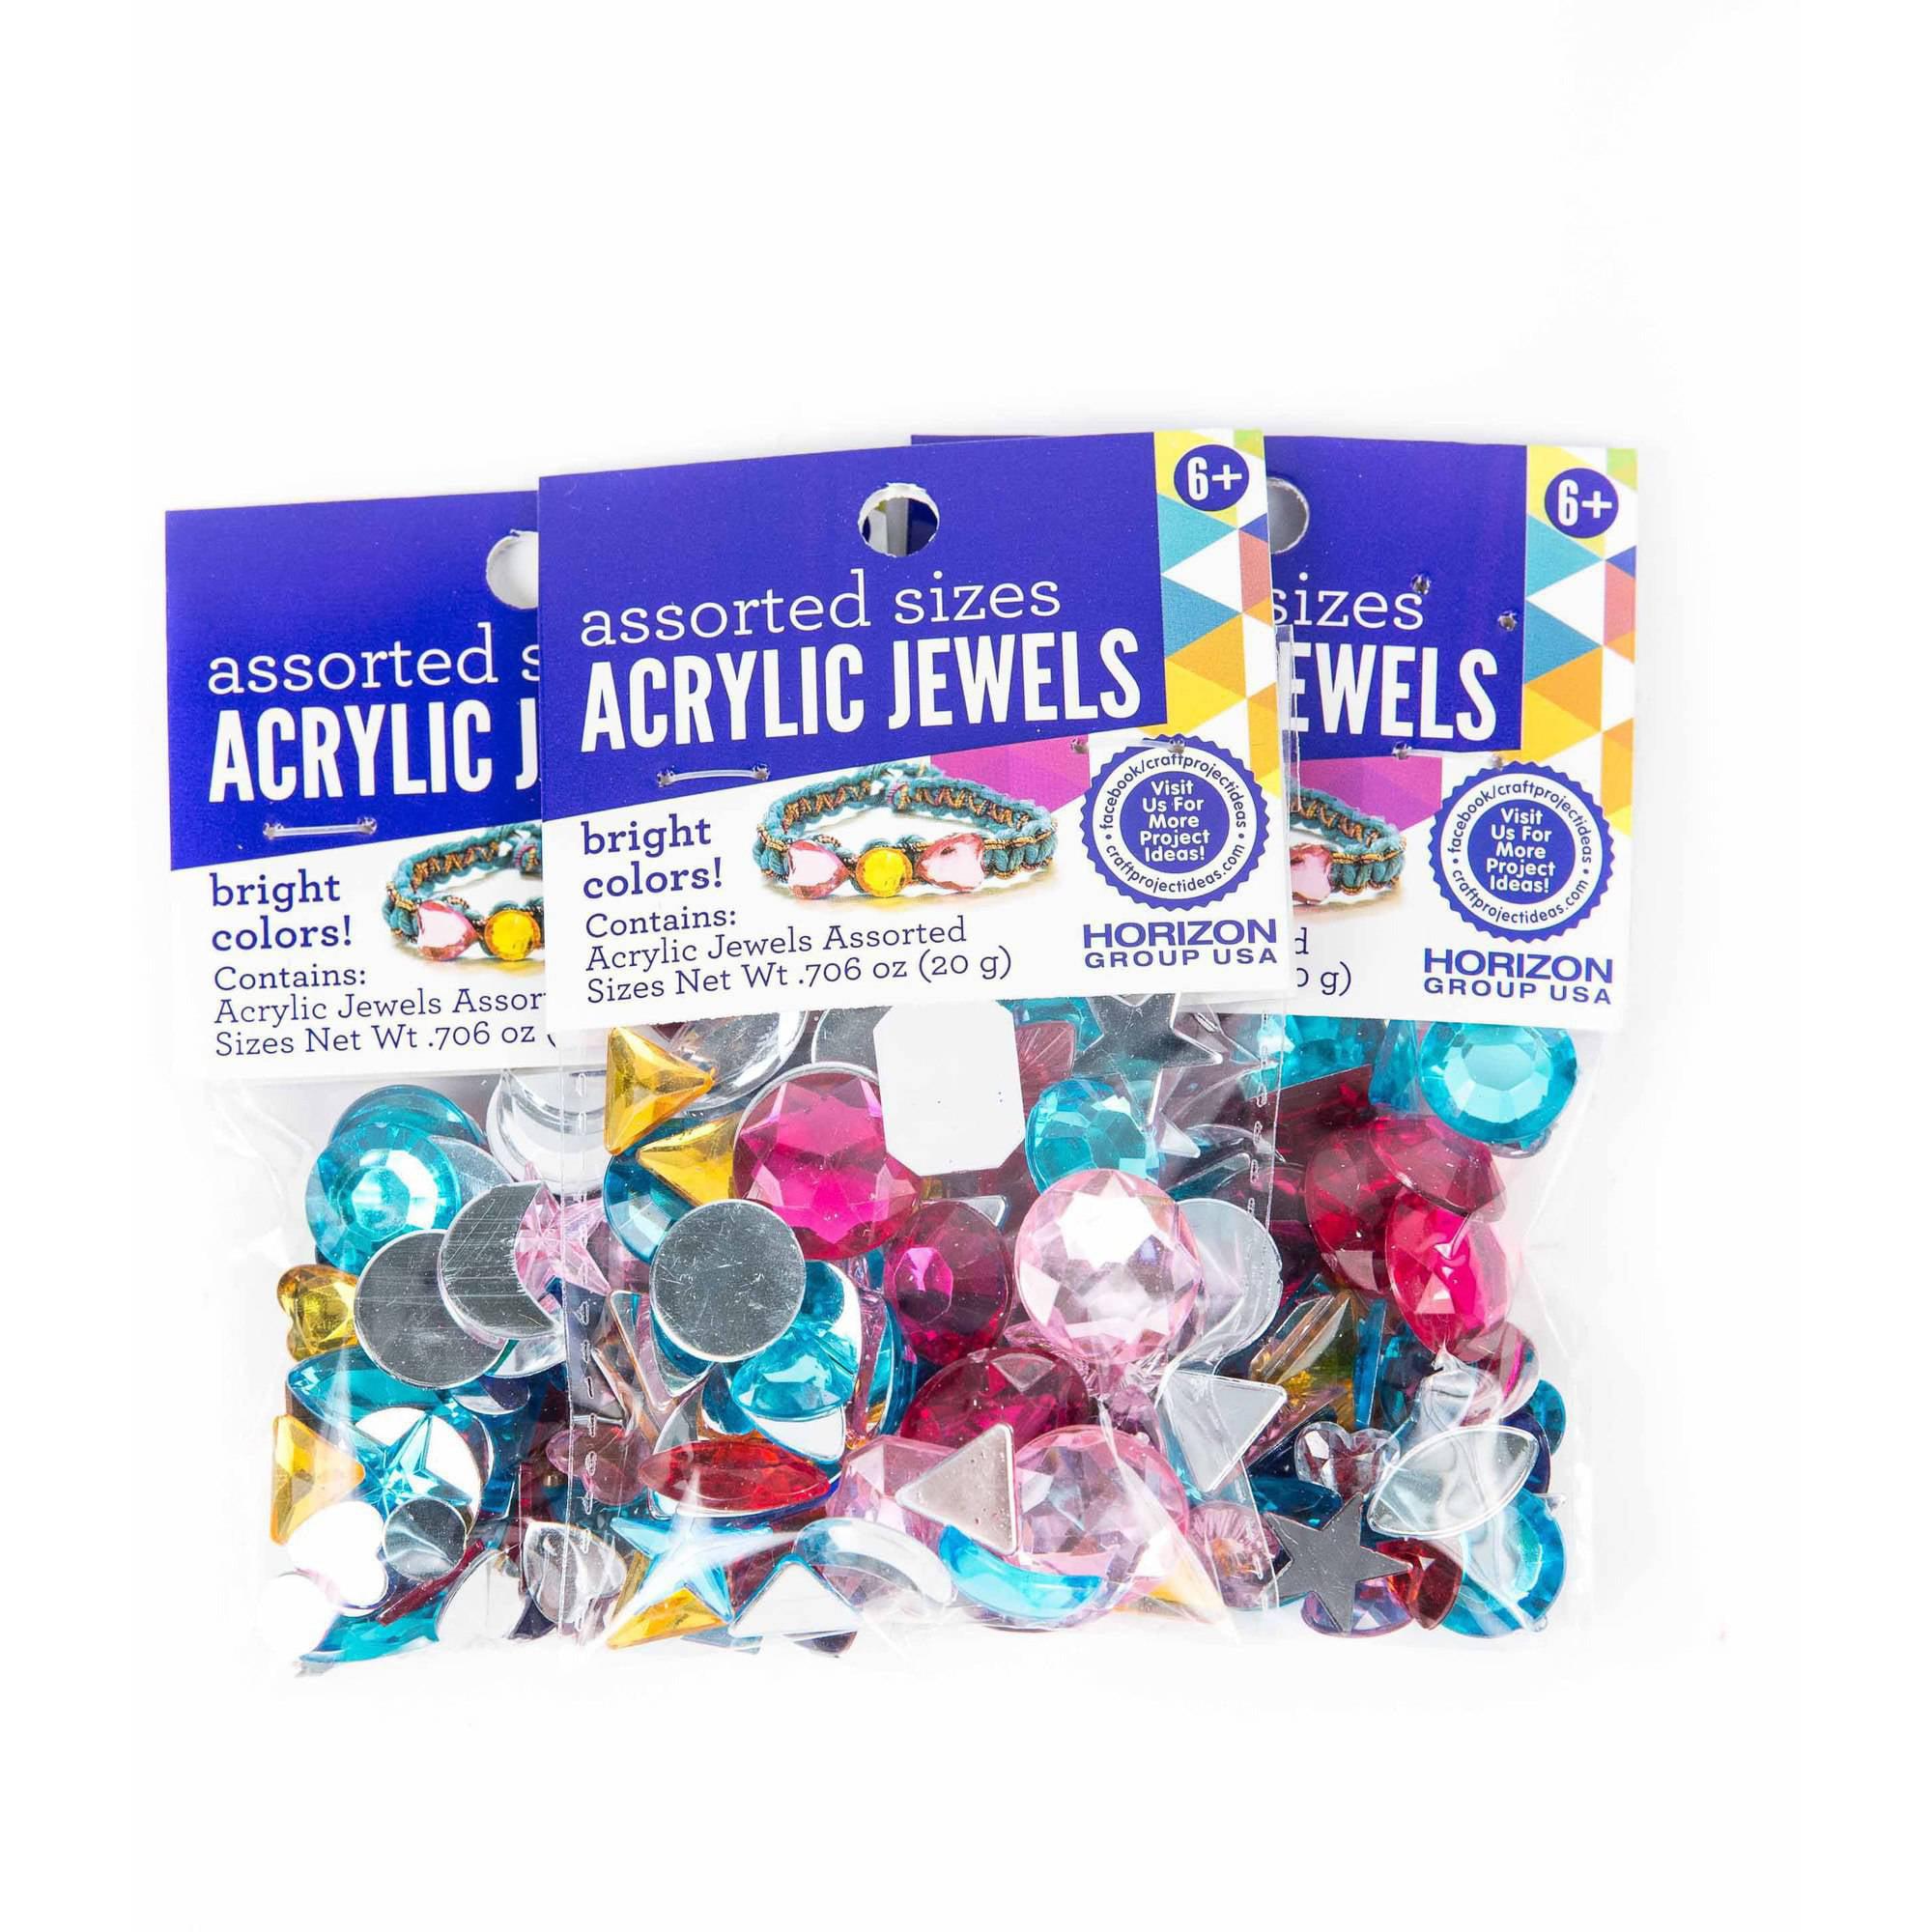 Assorted Shapes Acrylic Jewels, 3PKS - .70oz Each by Horizon Group USA